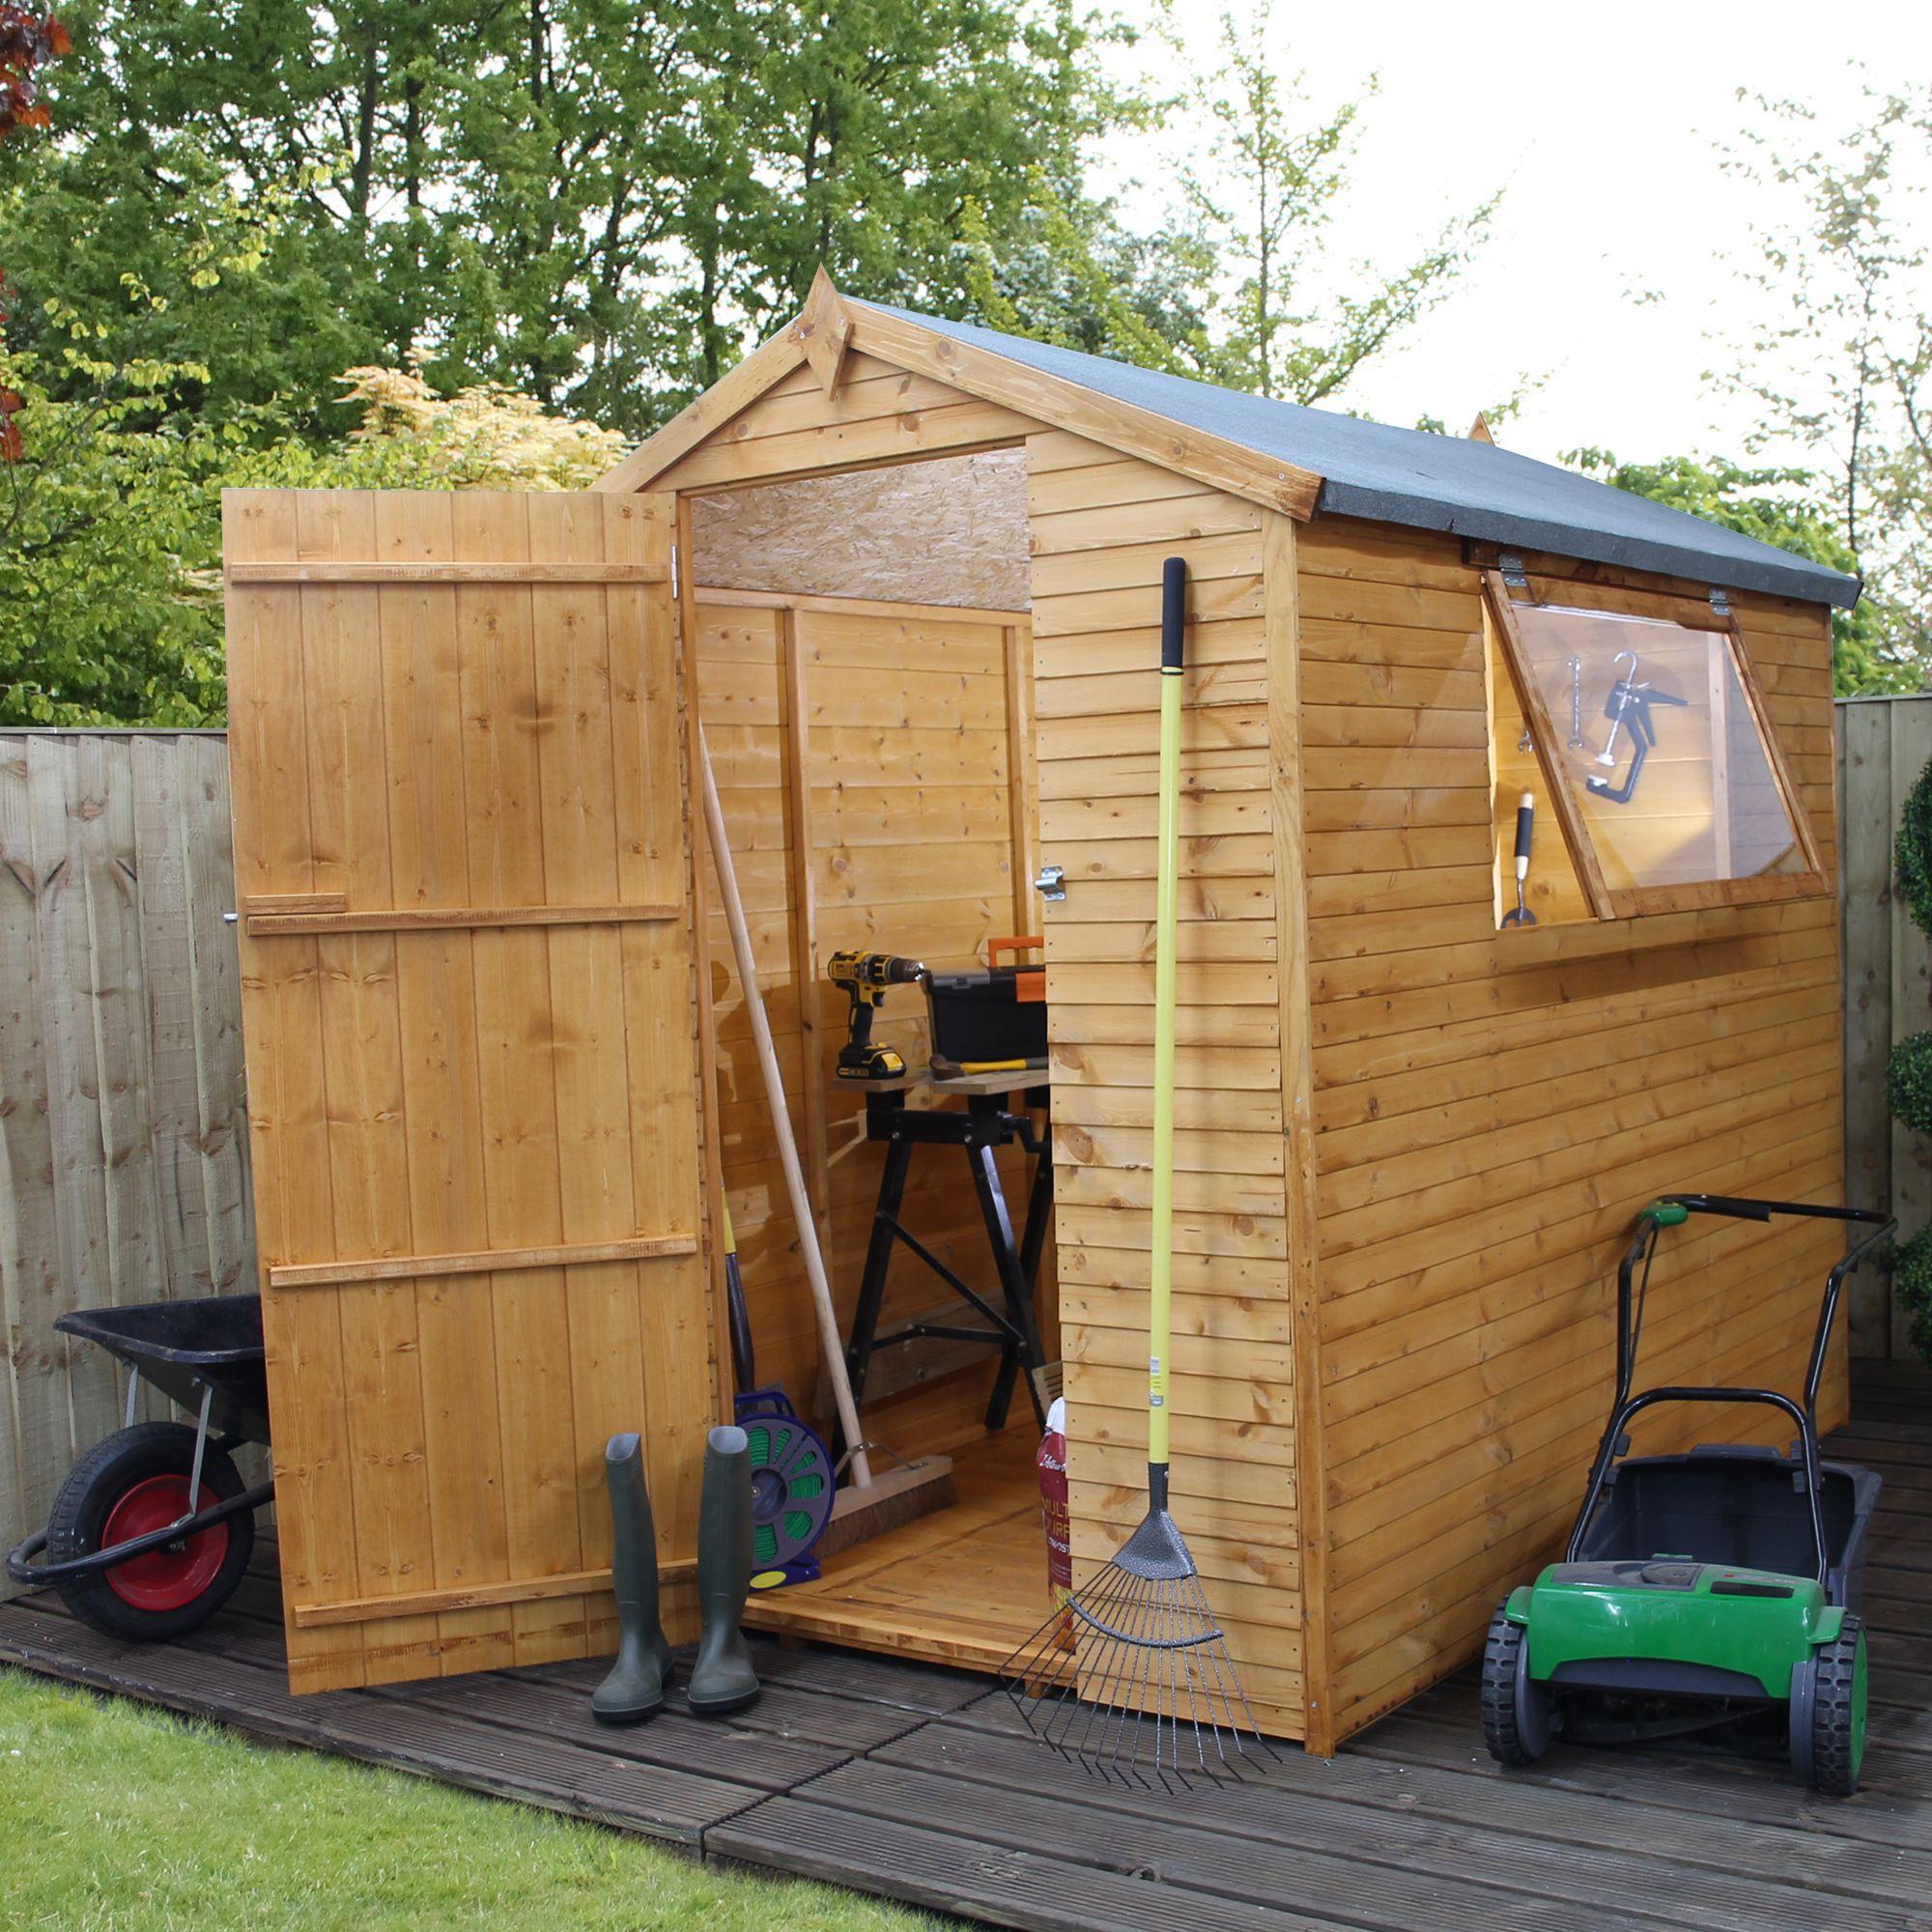 7x5 apex shiplap wooden shed - Garden Sheds 7x5